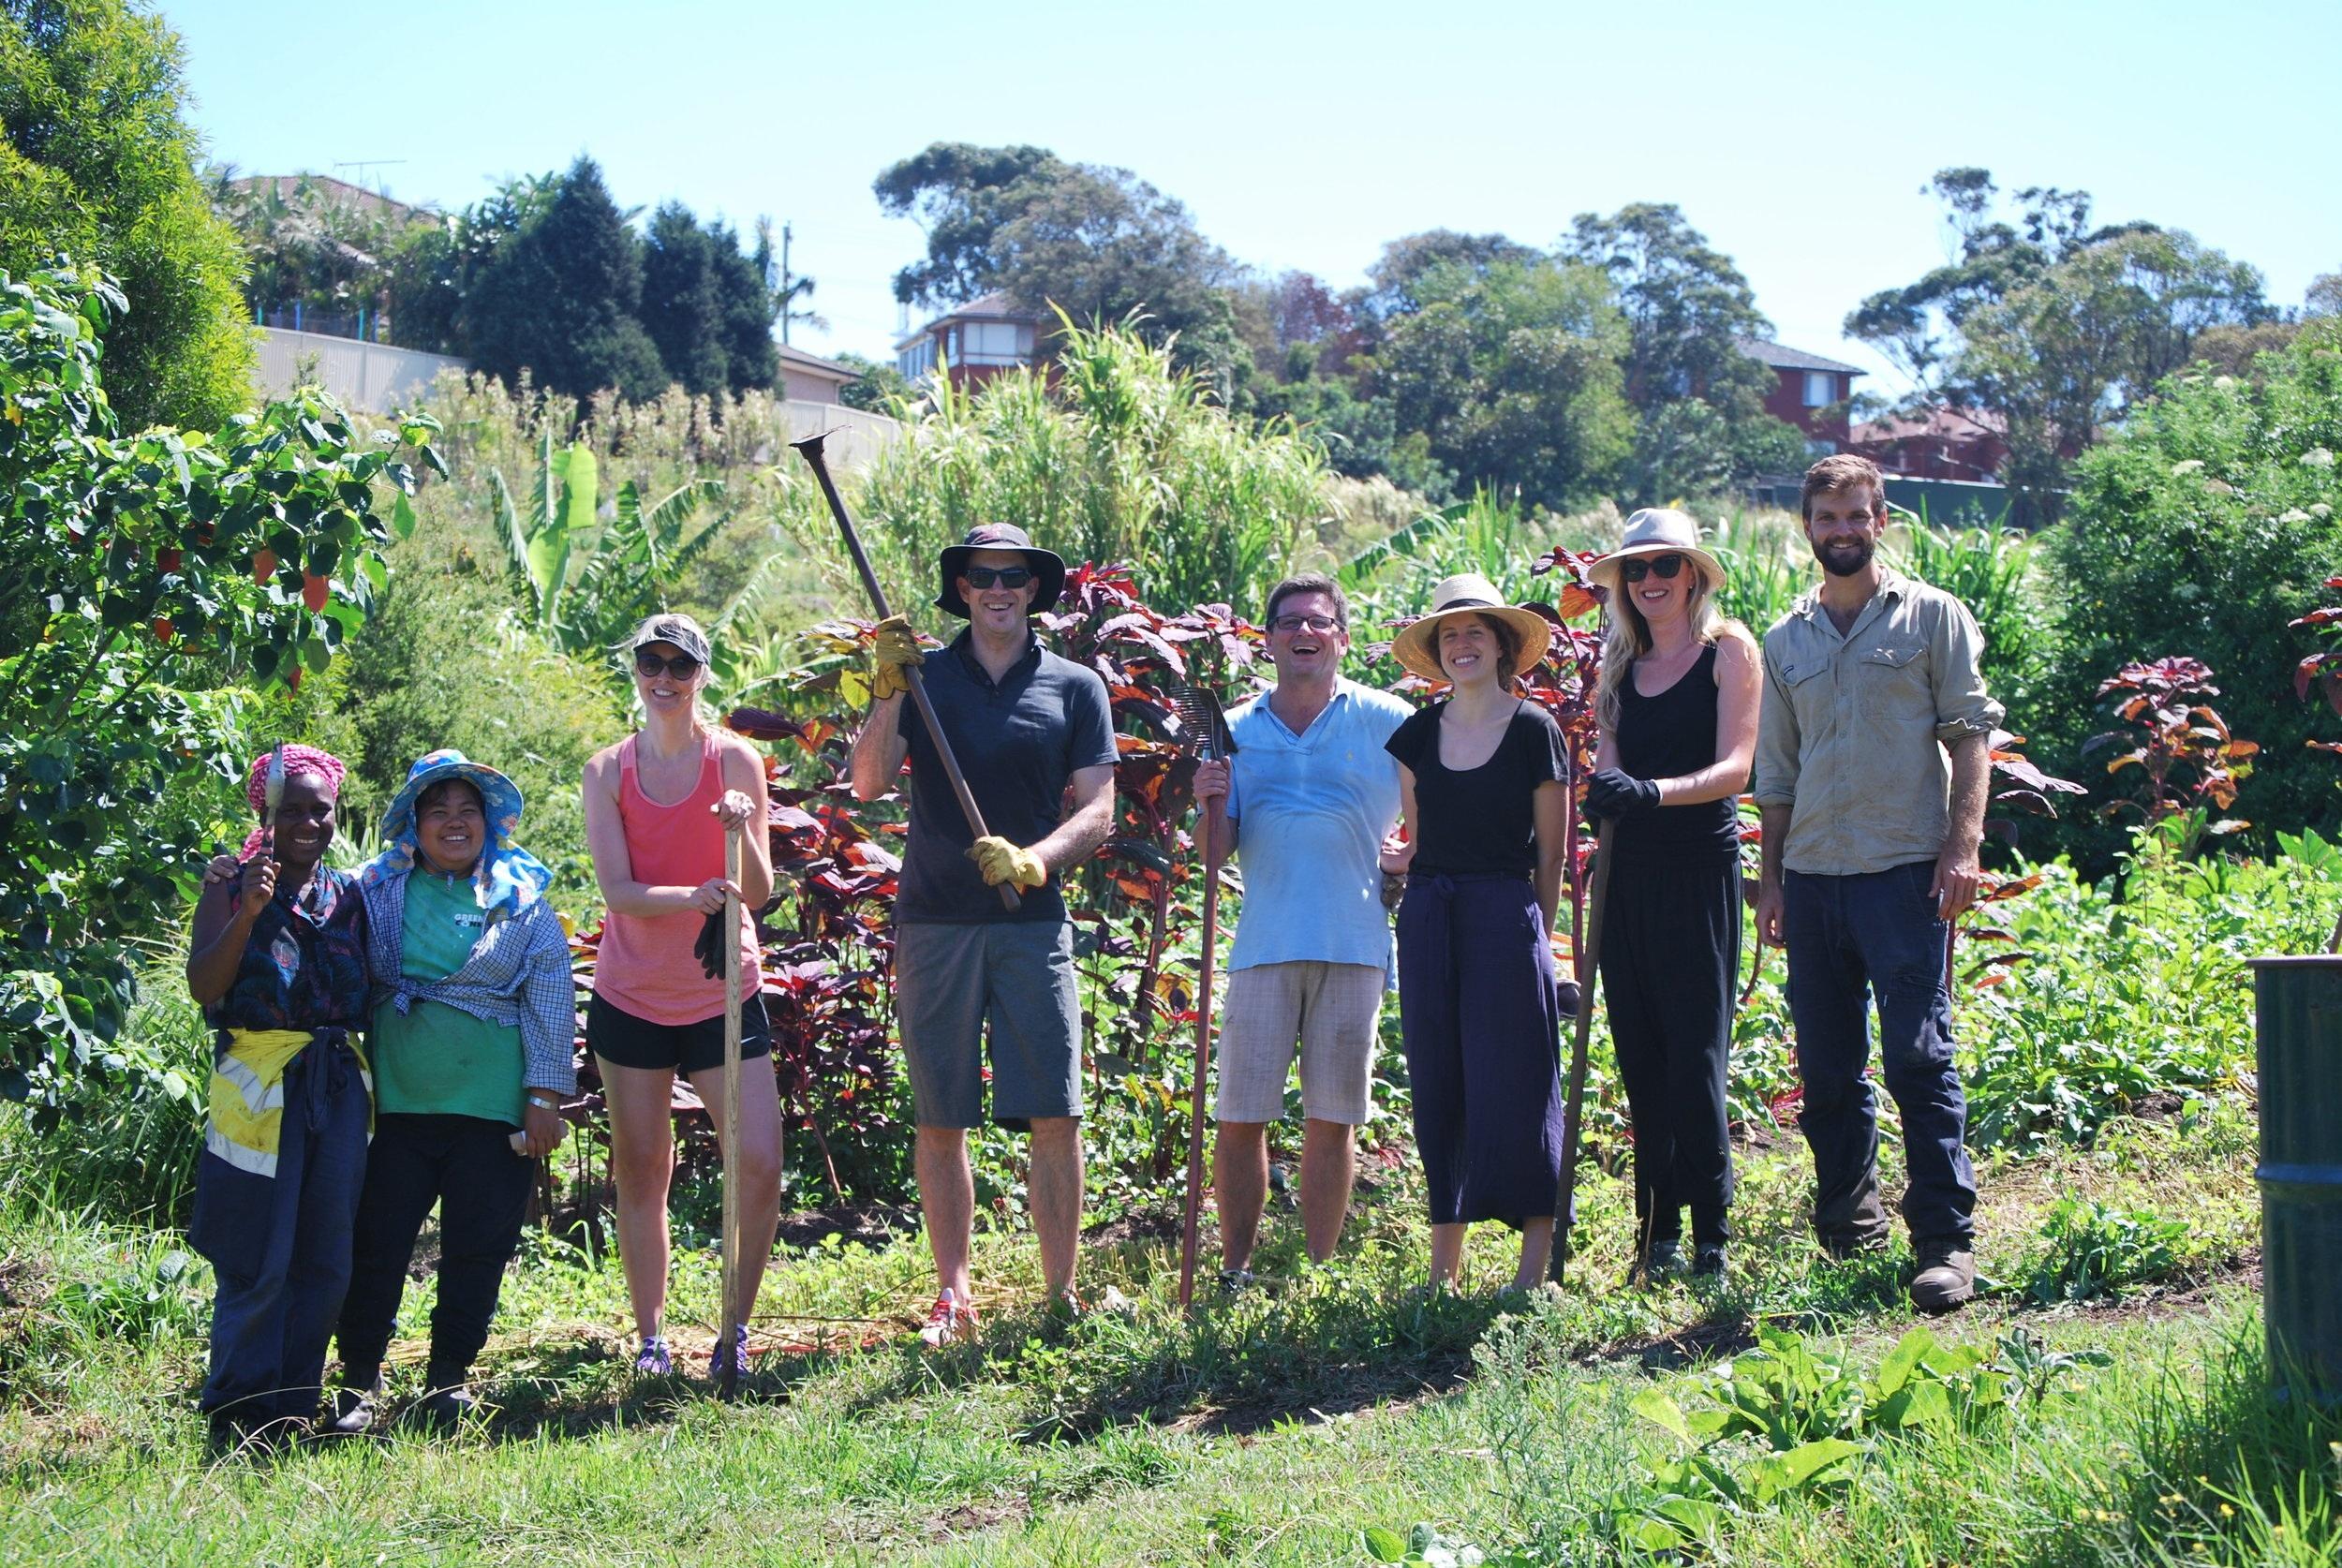 Visit My Farm Australia - Green Connect Farm, Warrawong NSW